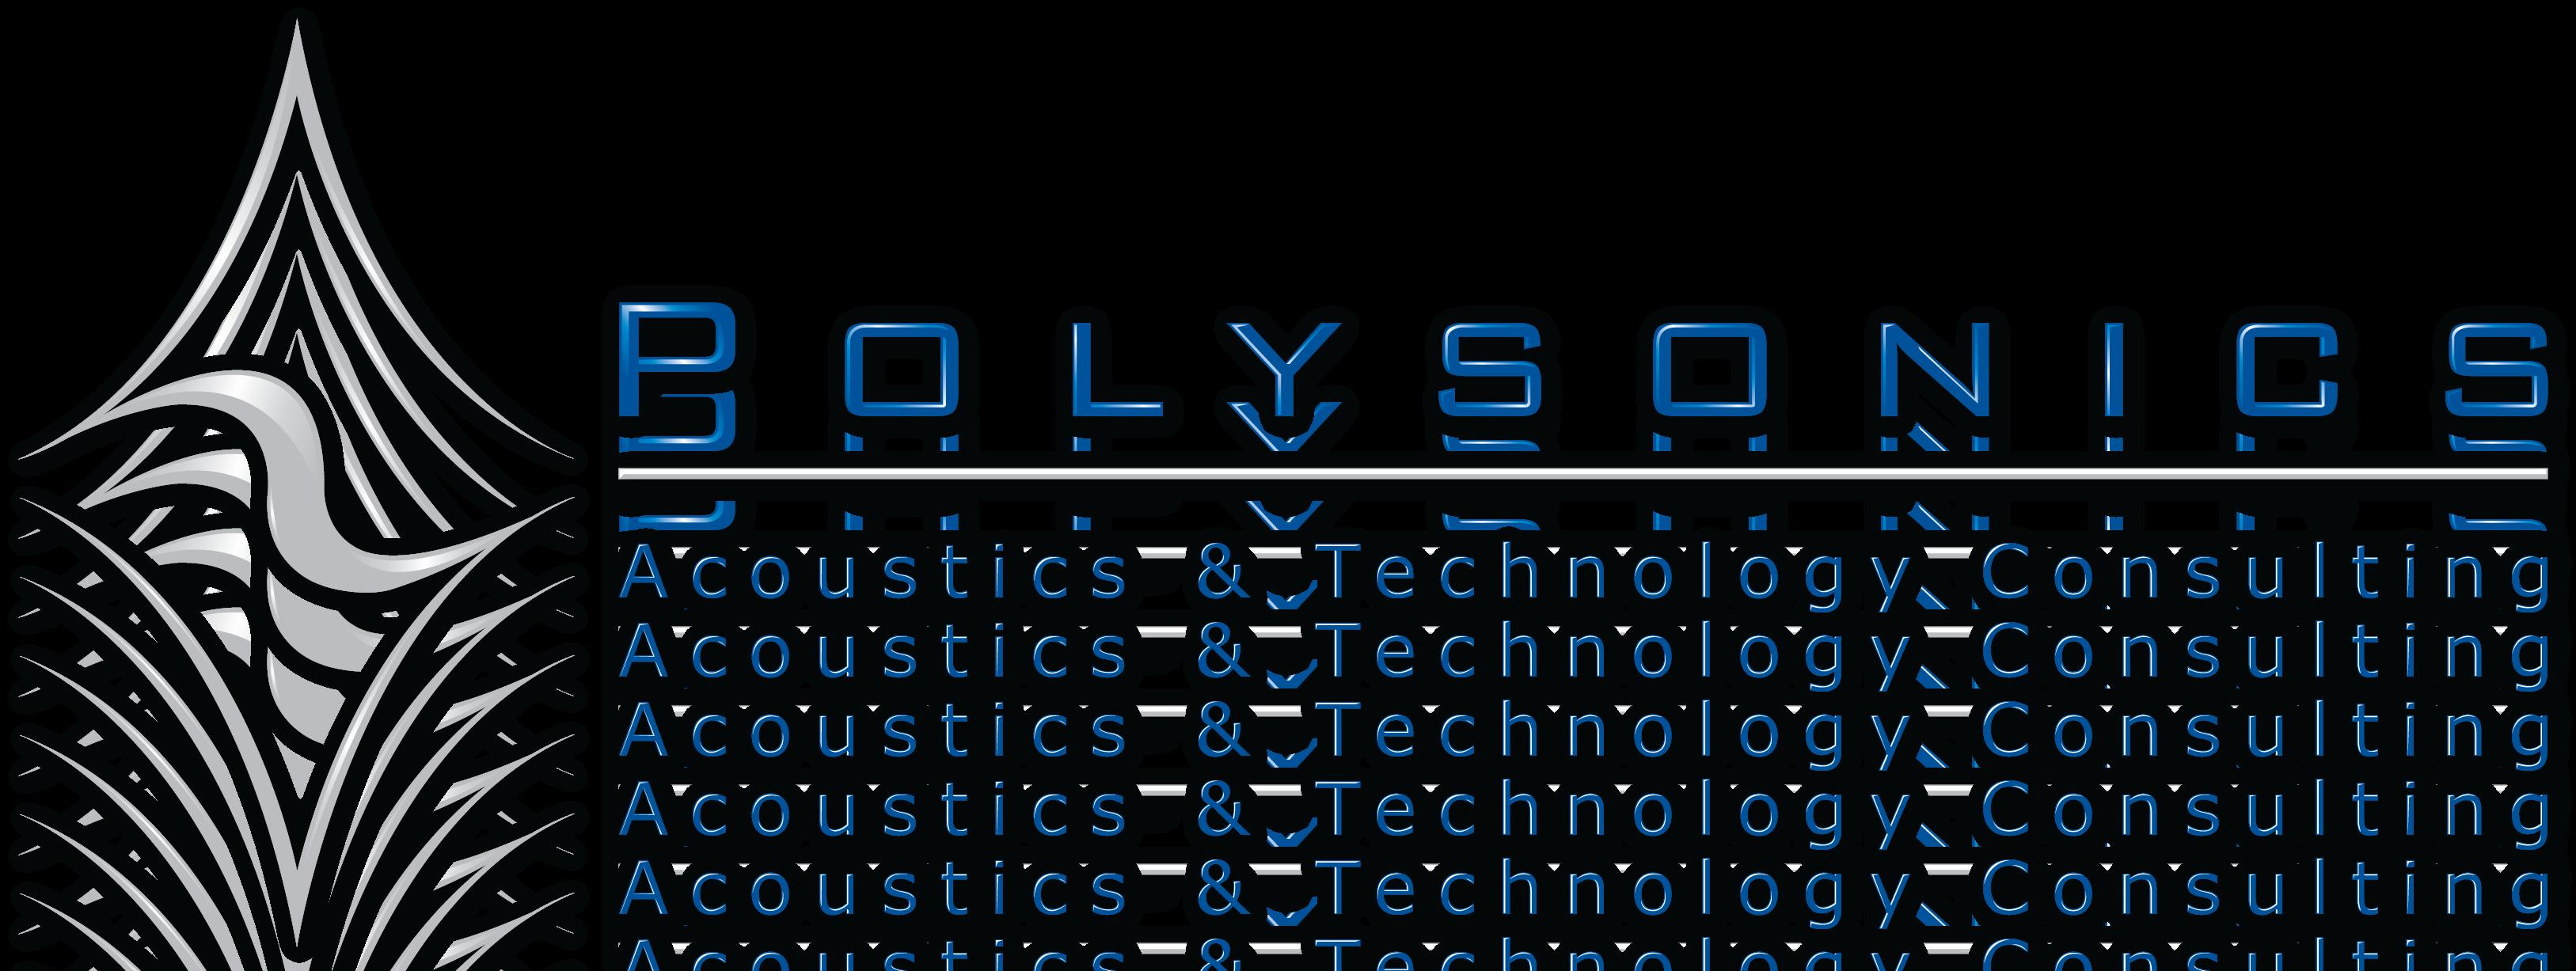 Polysonics Logo 2011_01-20_glossy